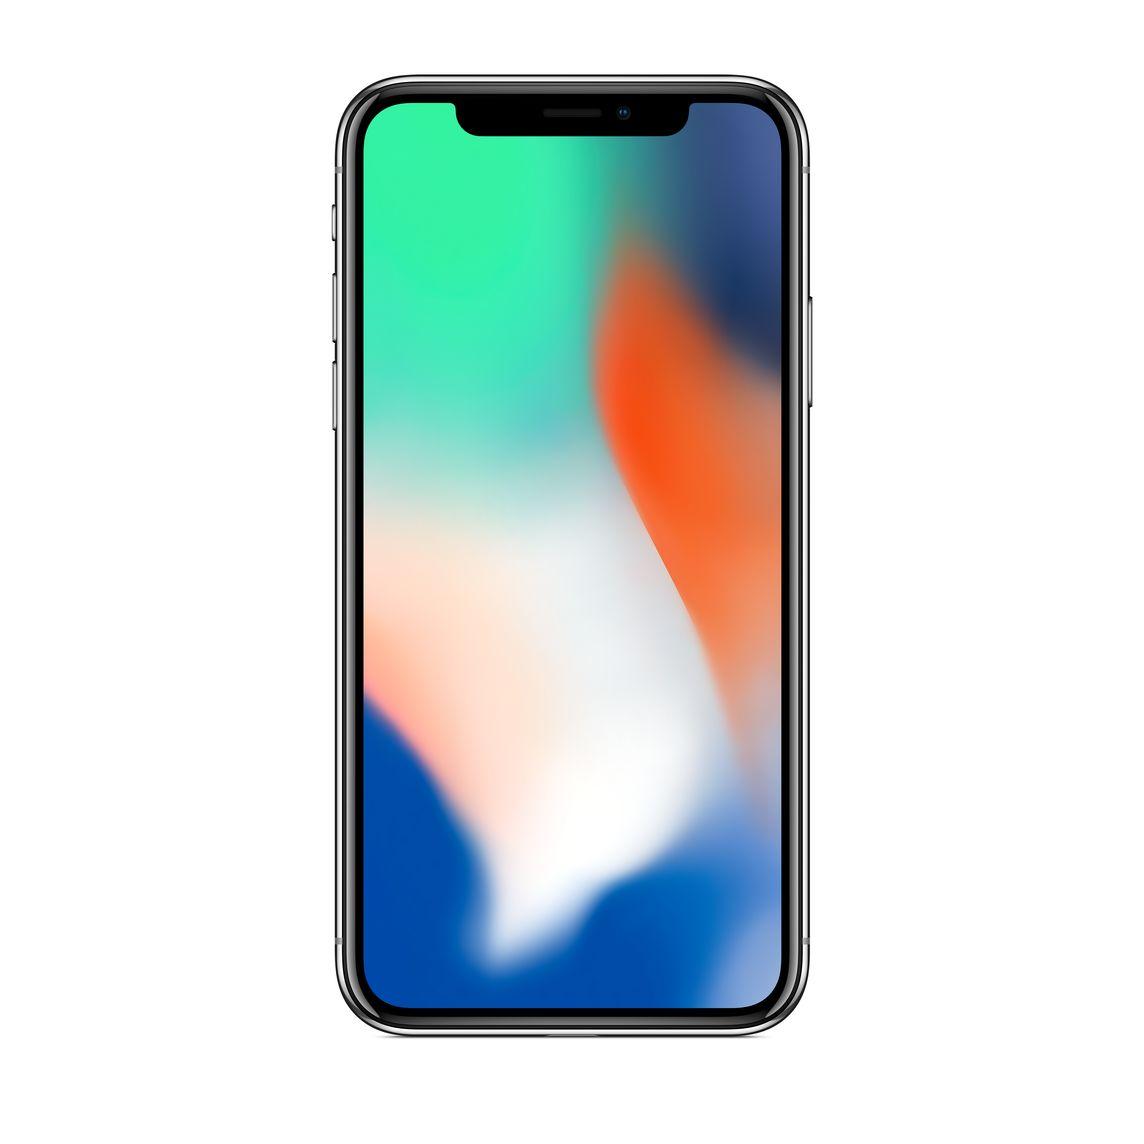 Refurbished Iphone X 64gb Silver Unlocked Apple